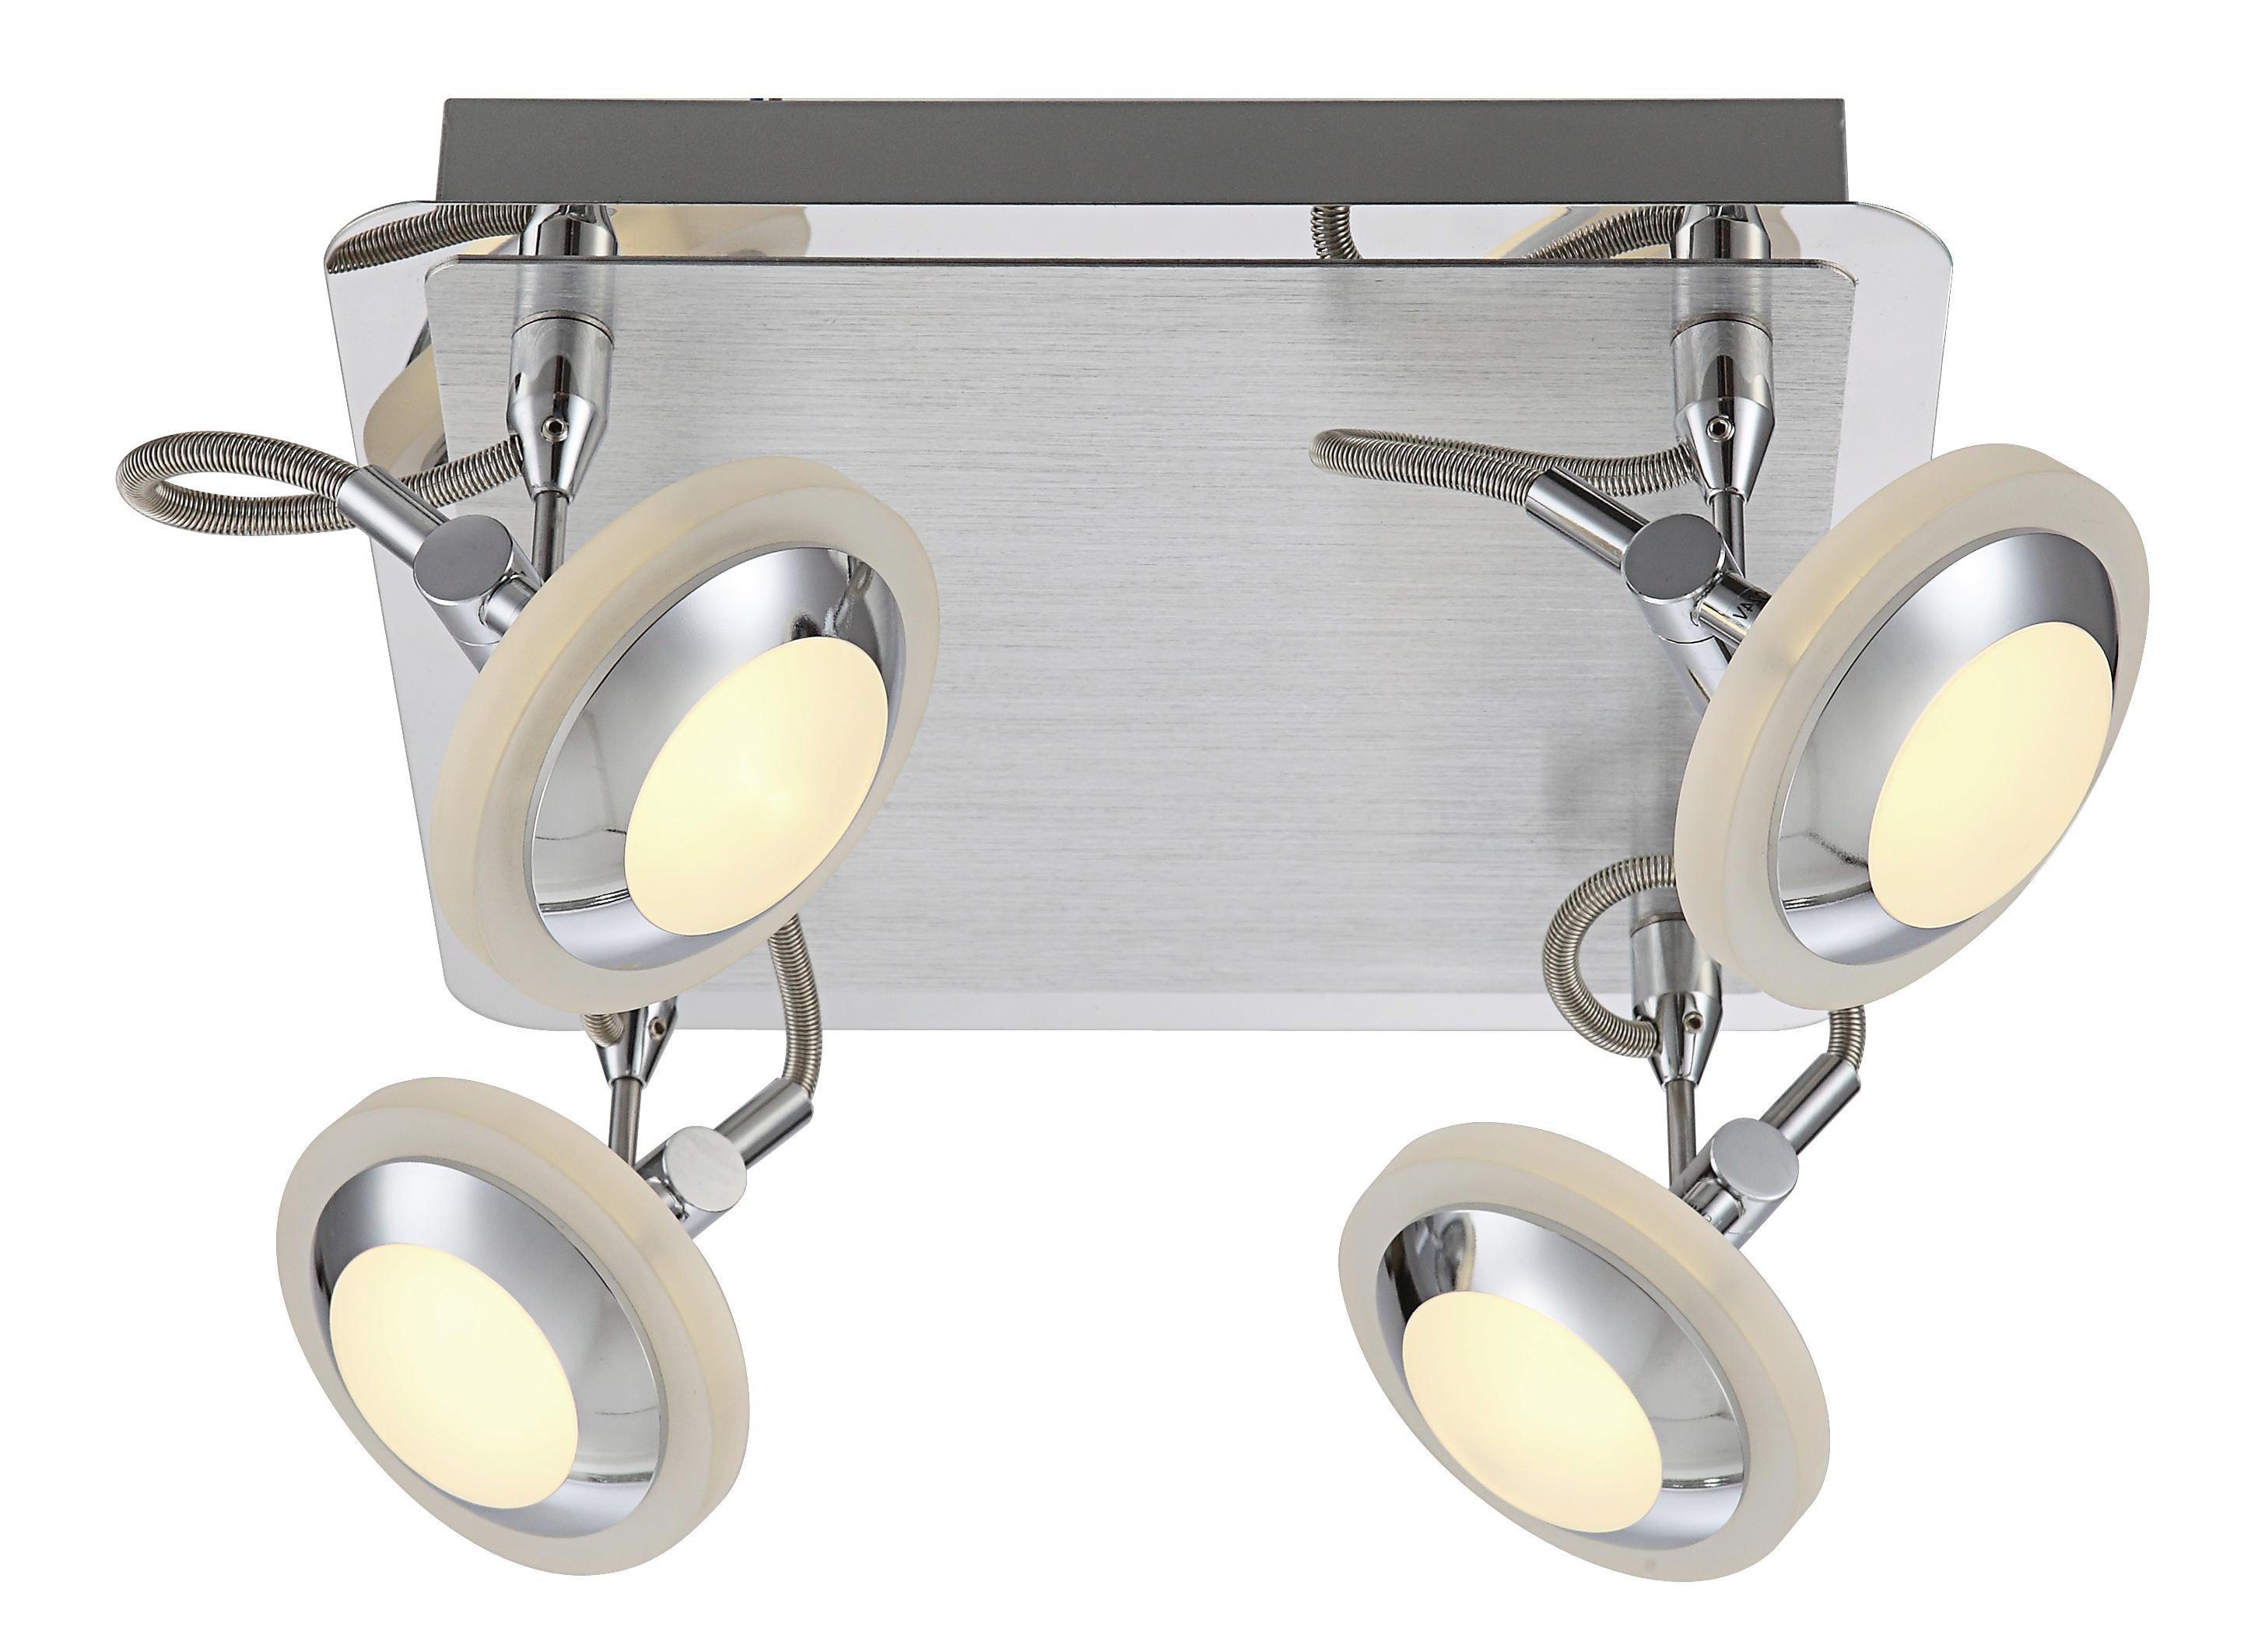 LED-STRAHLER - Chromfarben, Design, Kunststoff/Metall (25/25/16cm)